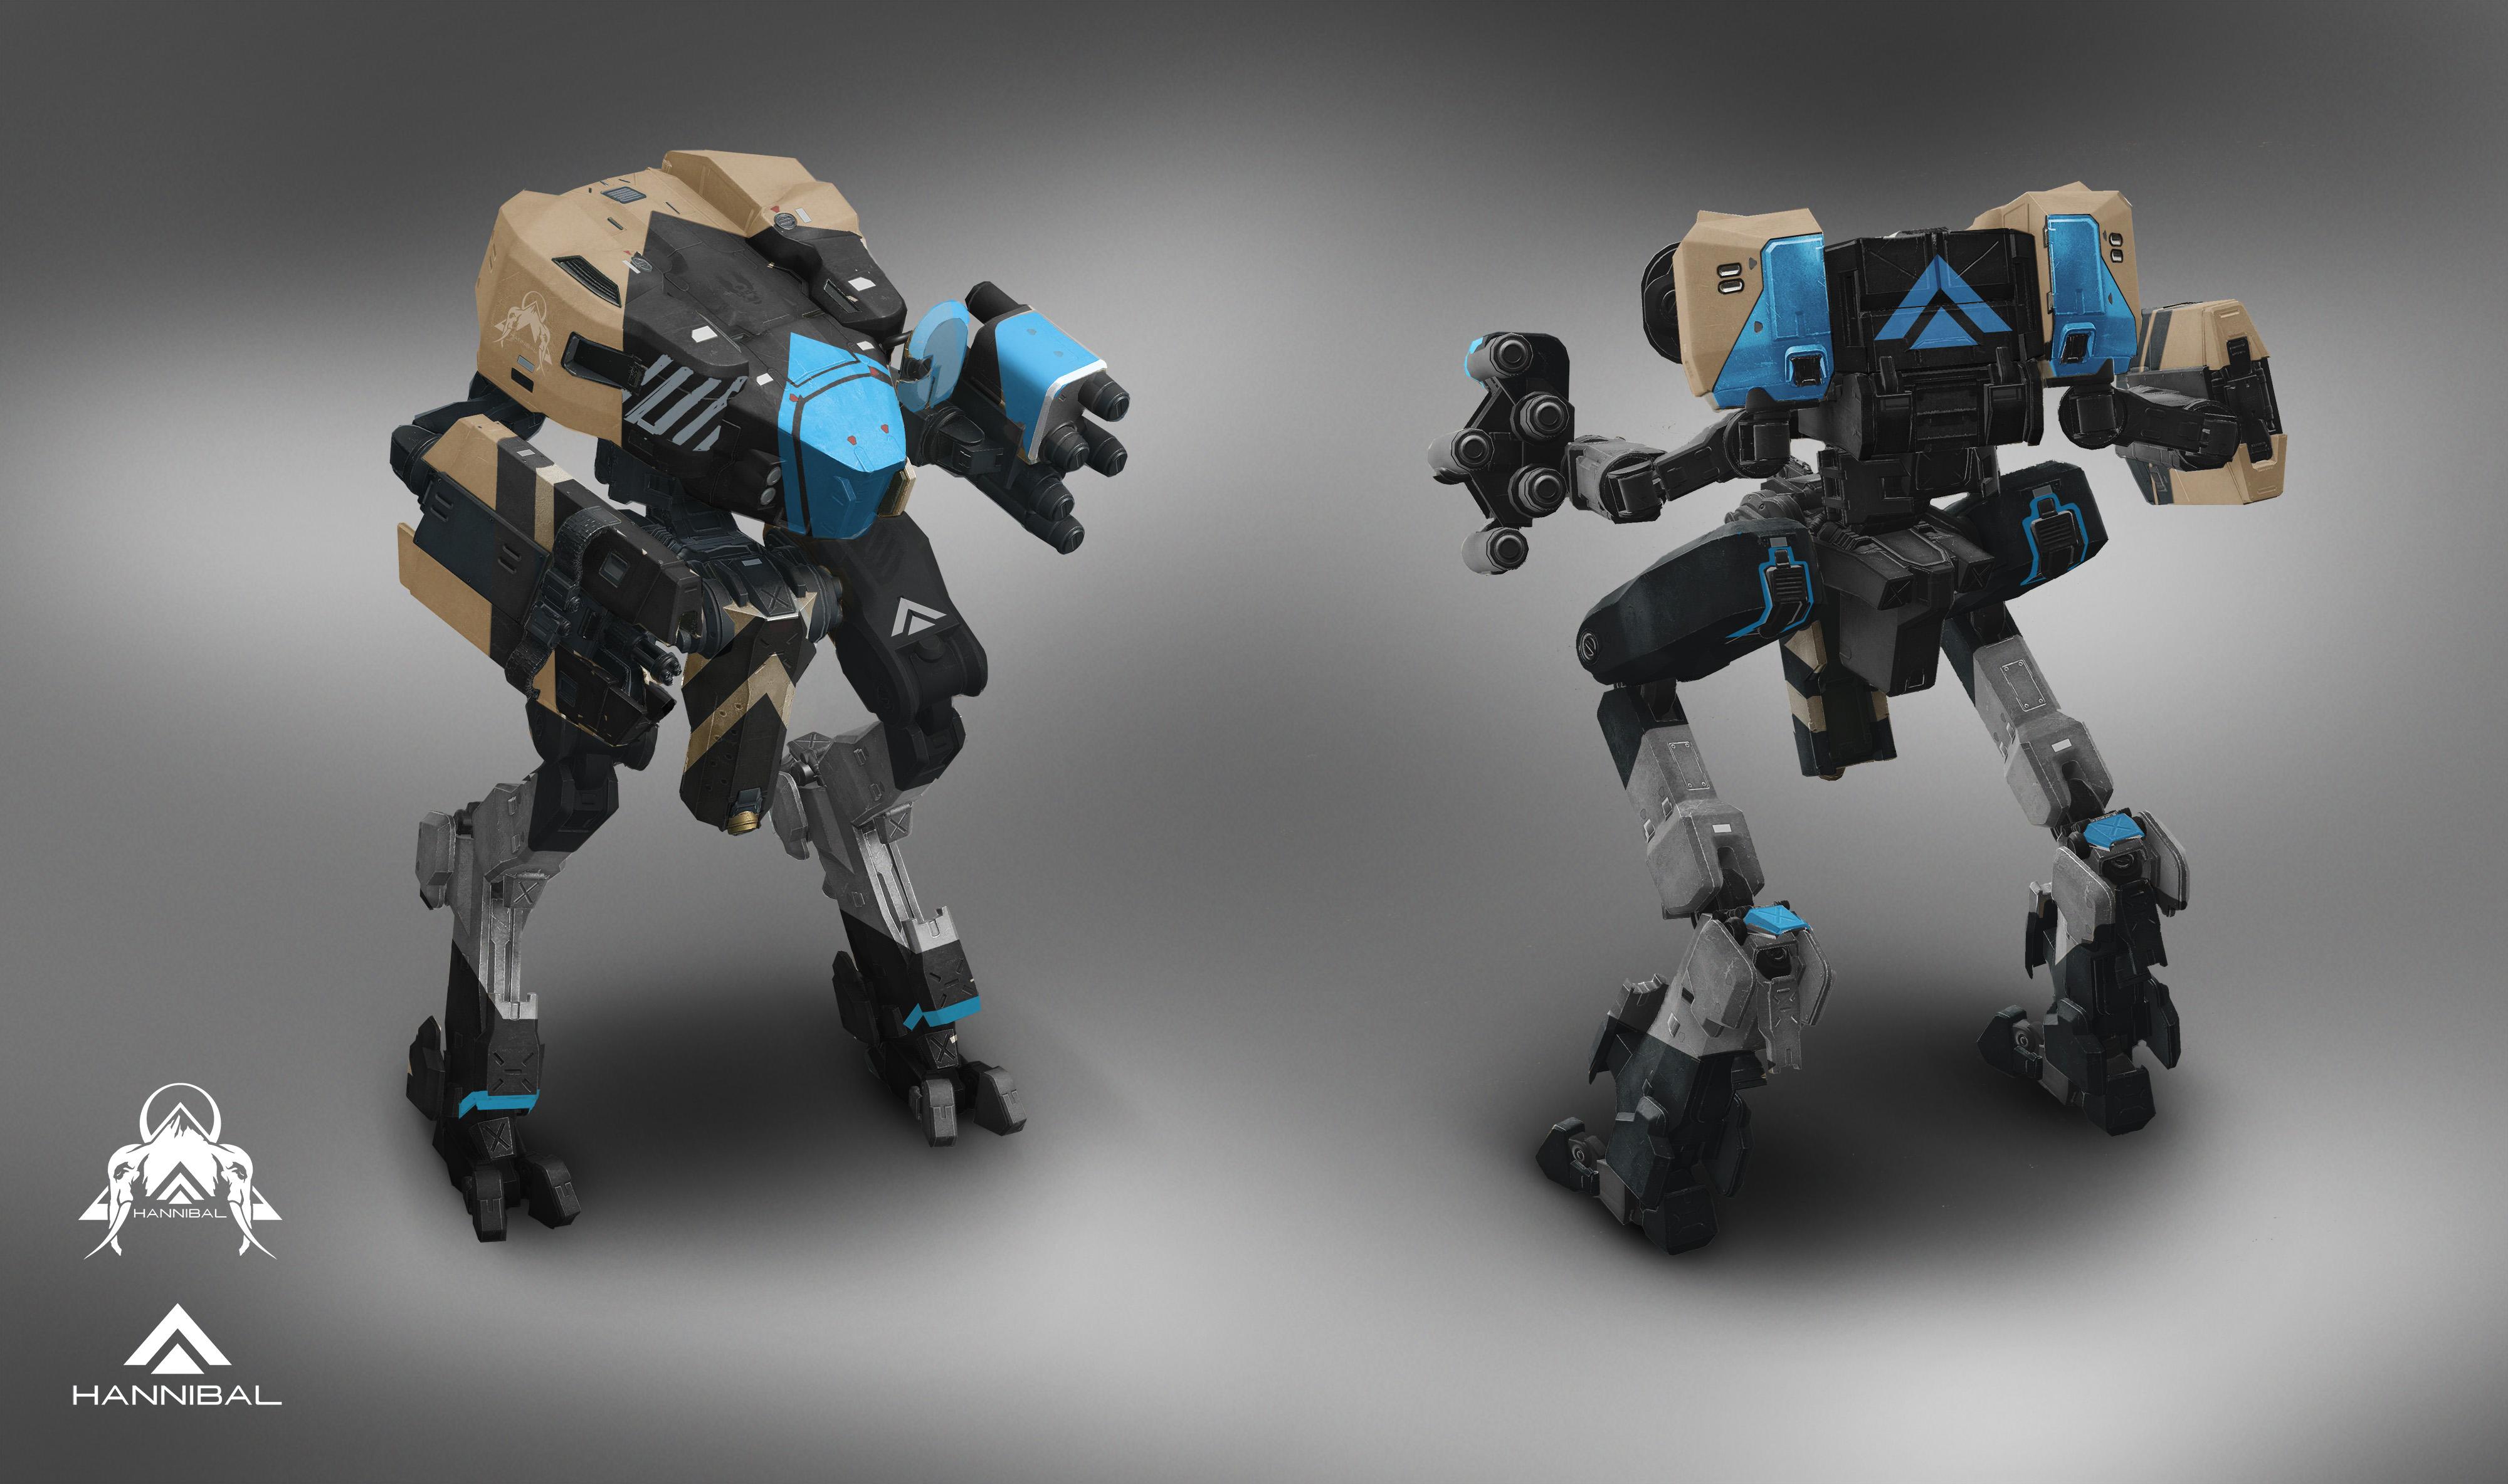 h5-guardians-mantis-hannibal-variant--a0